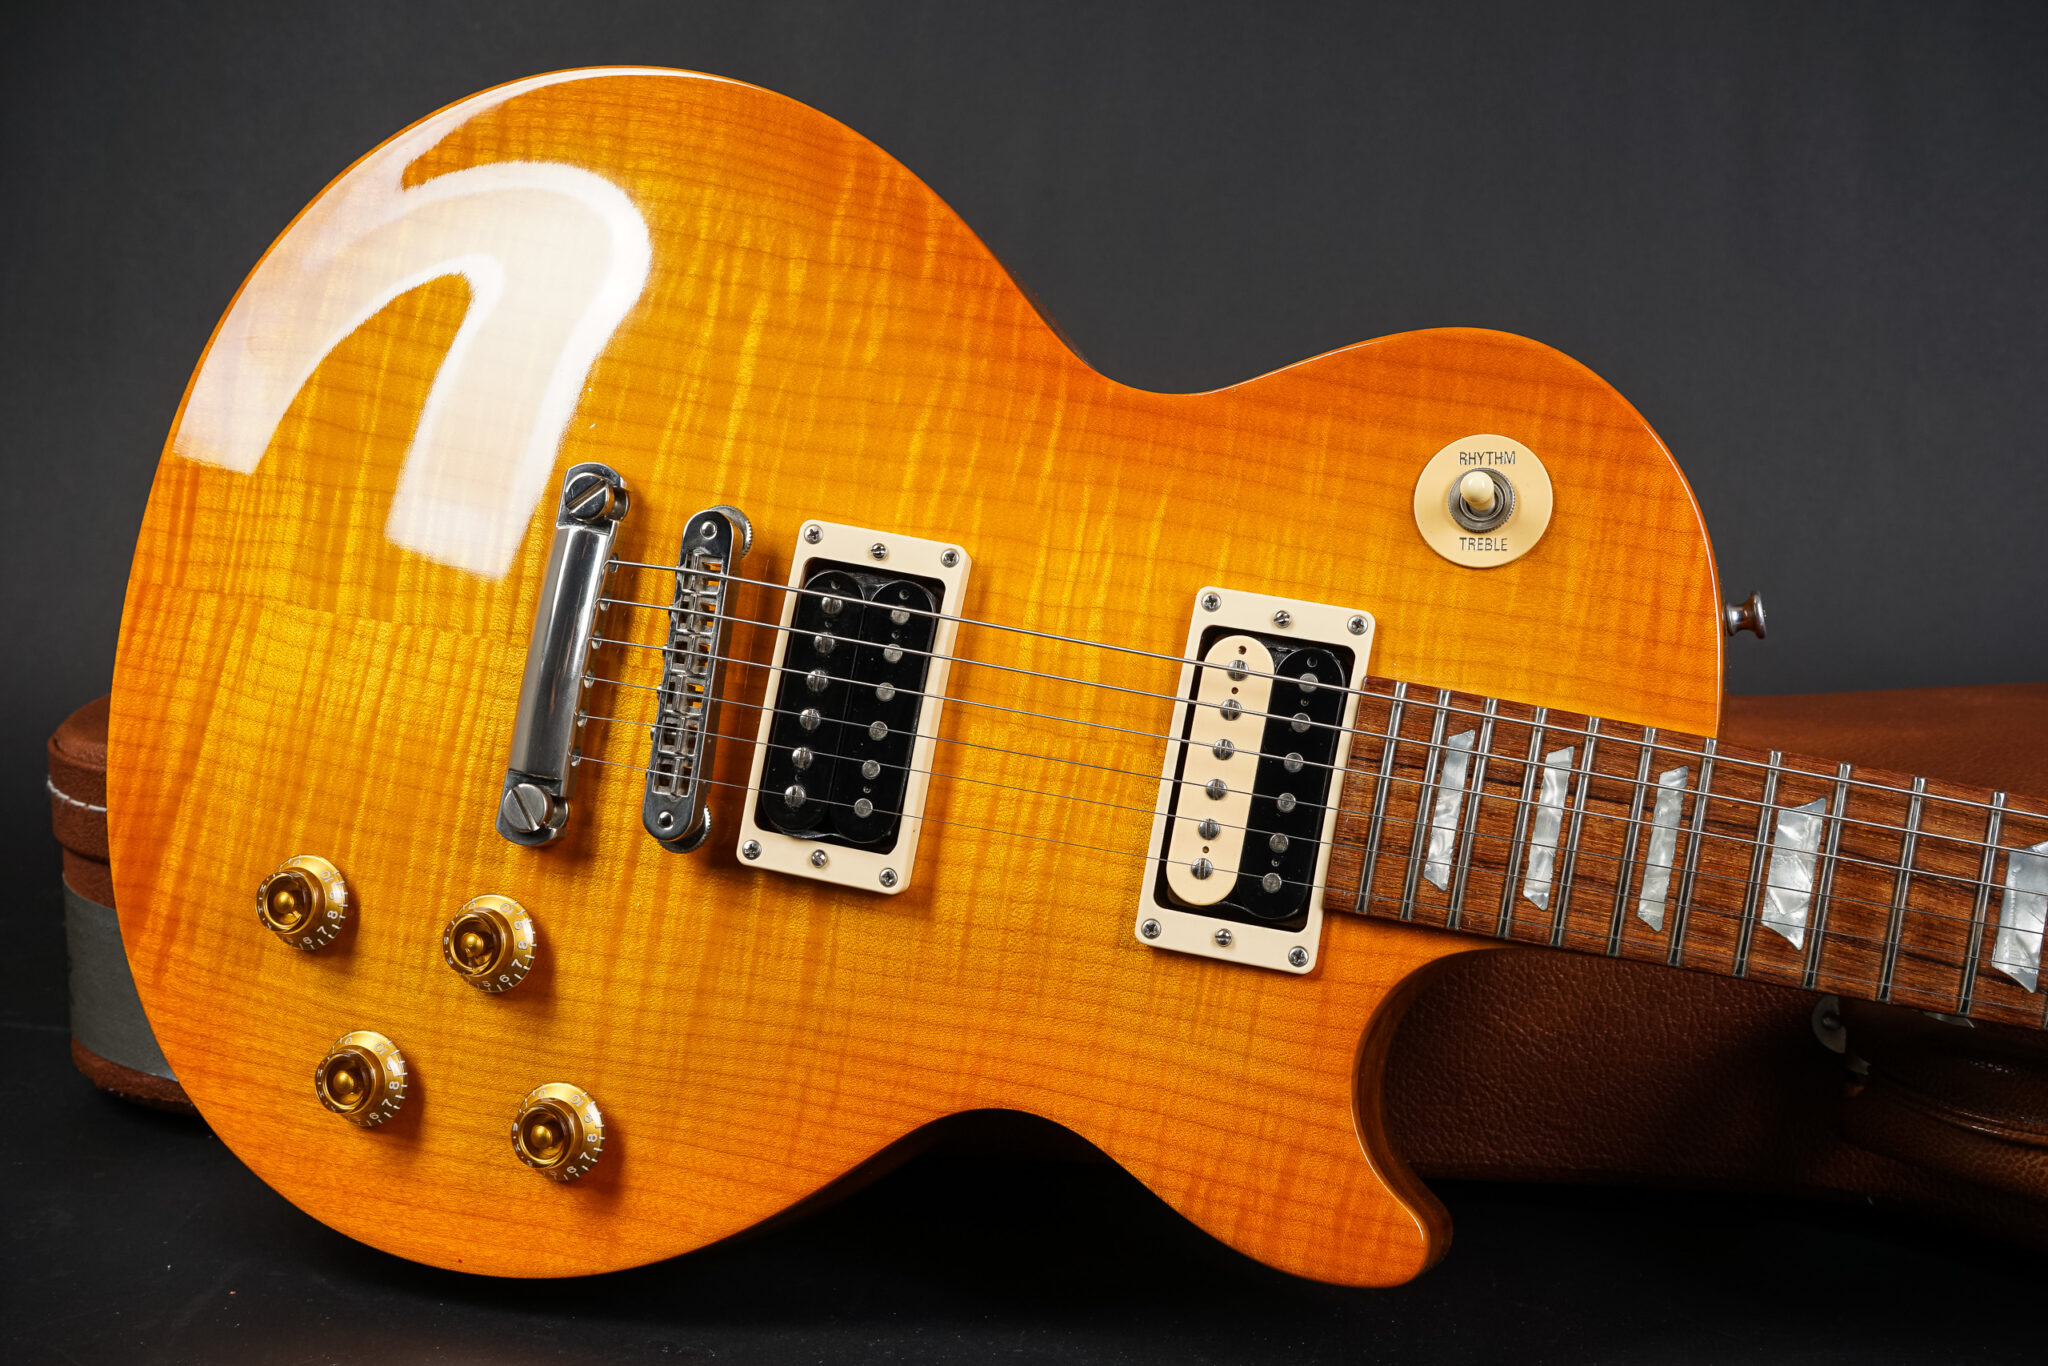 https://guitarpoint.de/app/uploads/products/2000-gibson-les-paul-gary-moore-signature-lemonburst/2000-Gibson-Gary-Moore-02360358-Lemonburst-8-2048x1366.jpg